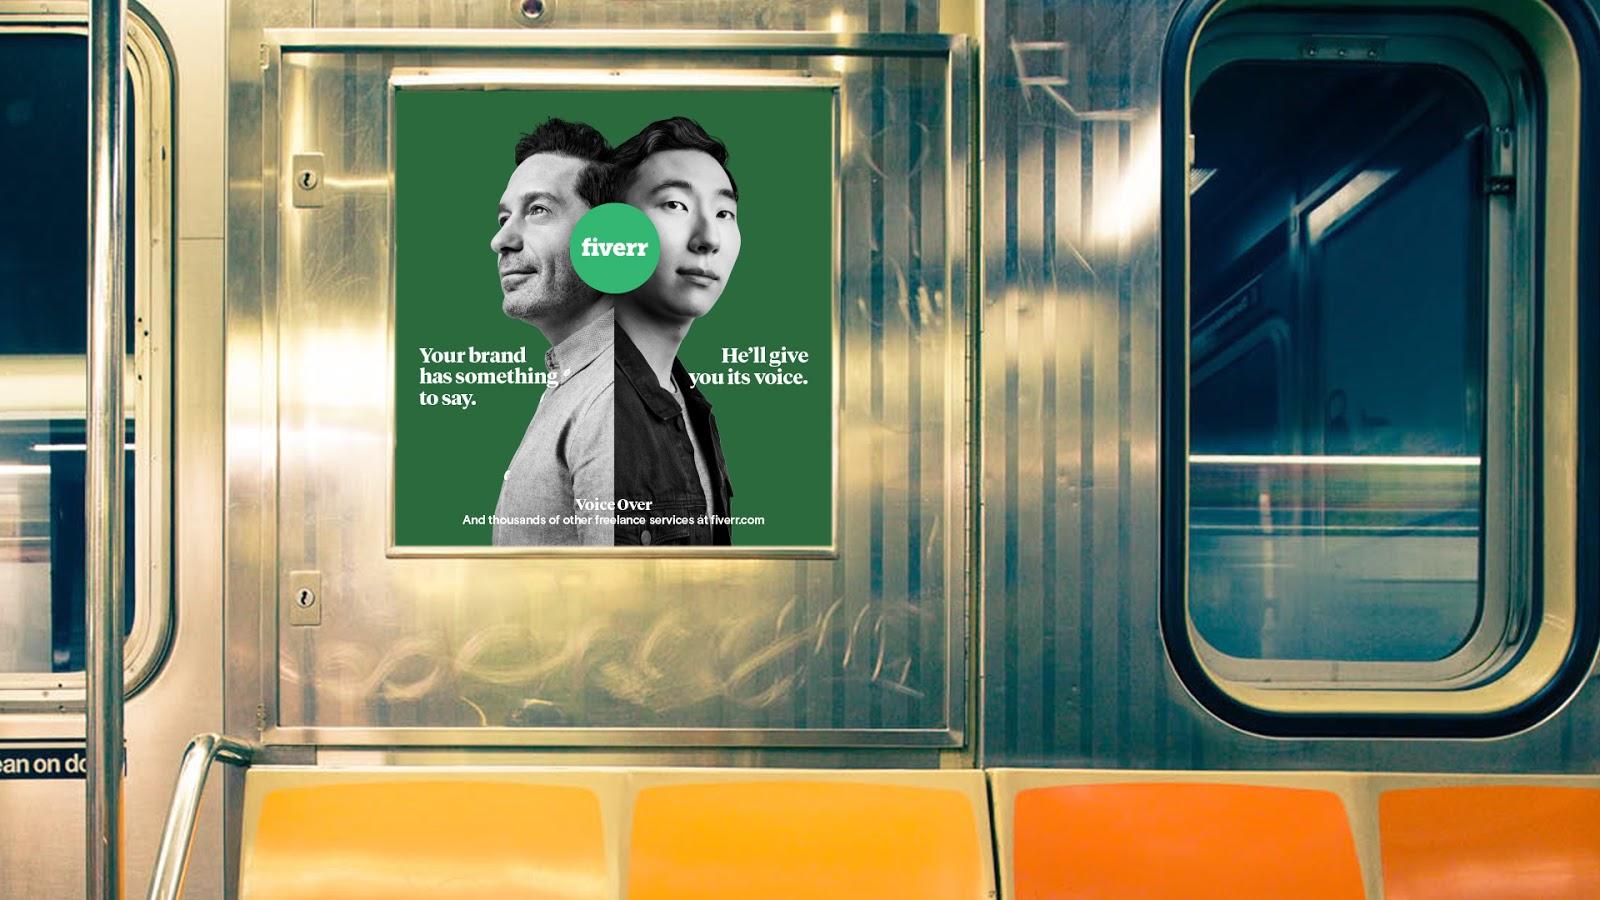 SubwayInterior_Fiverr_12.14.18.jpg